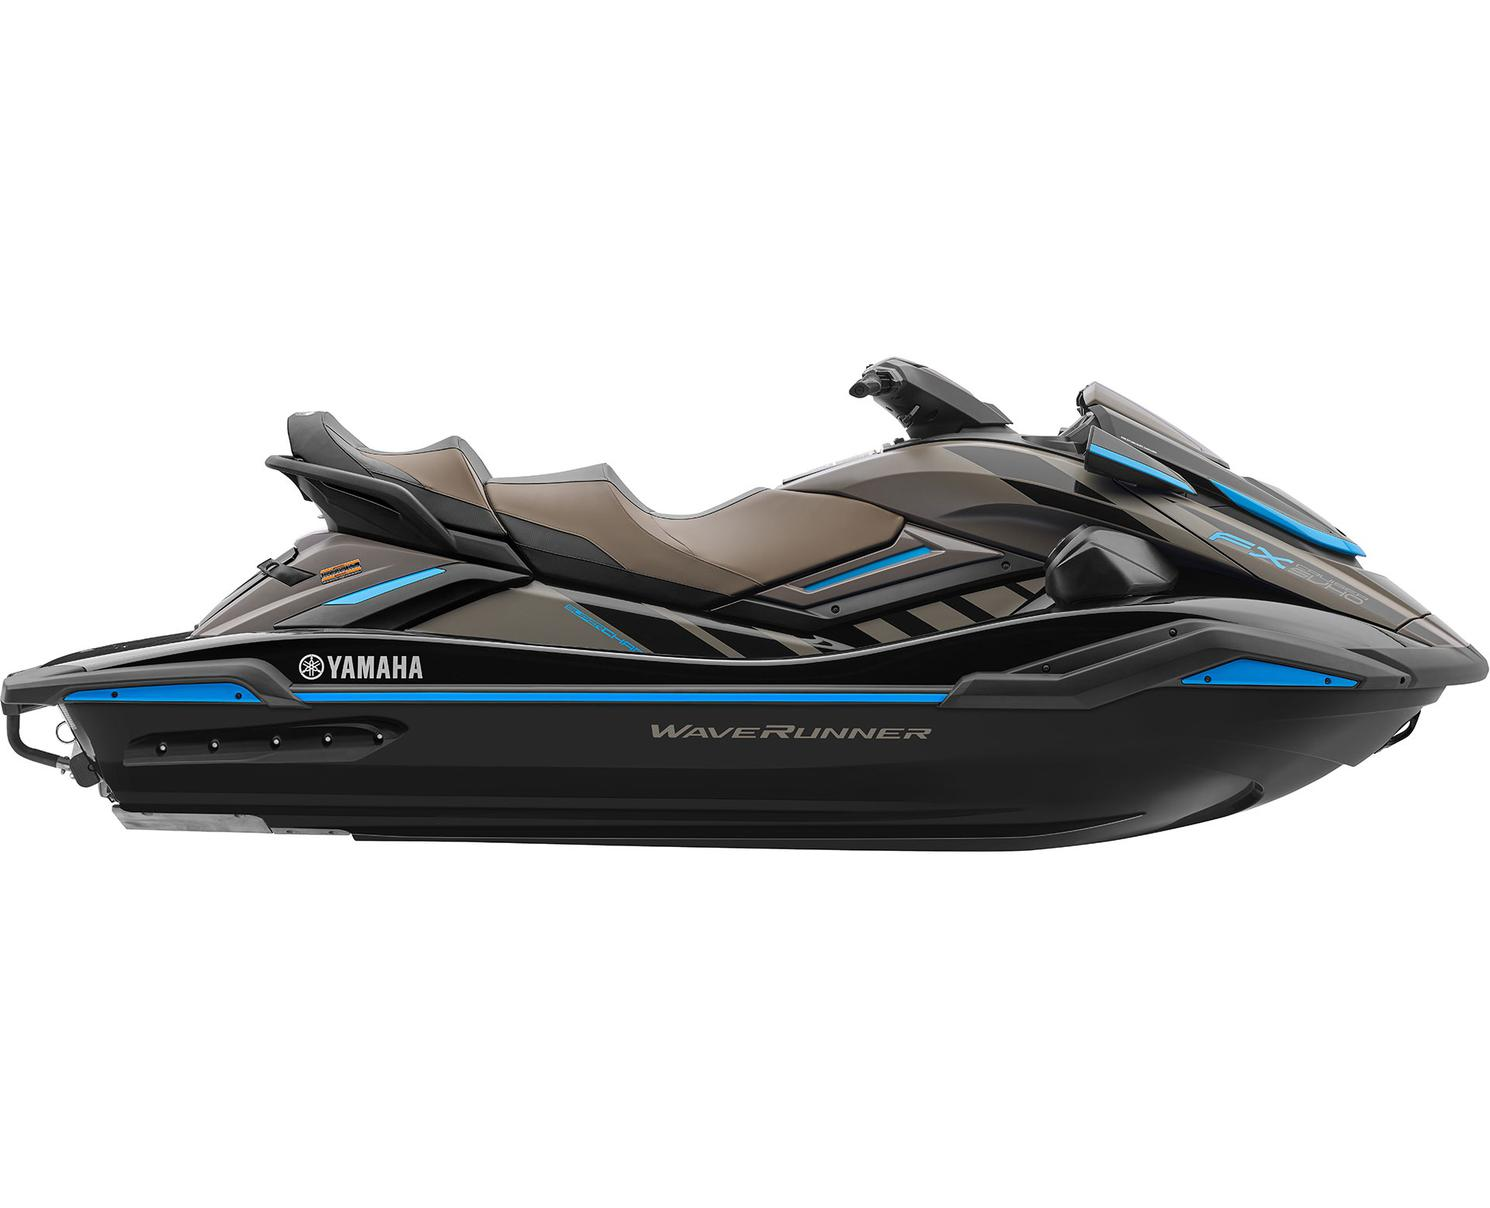 2022 Yamaha FX Cruiser SVHO Black/Titan Grey